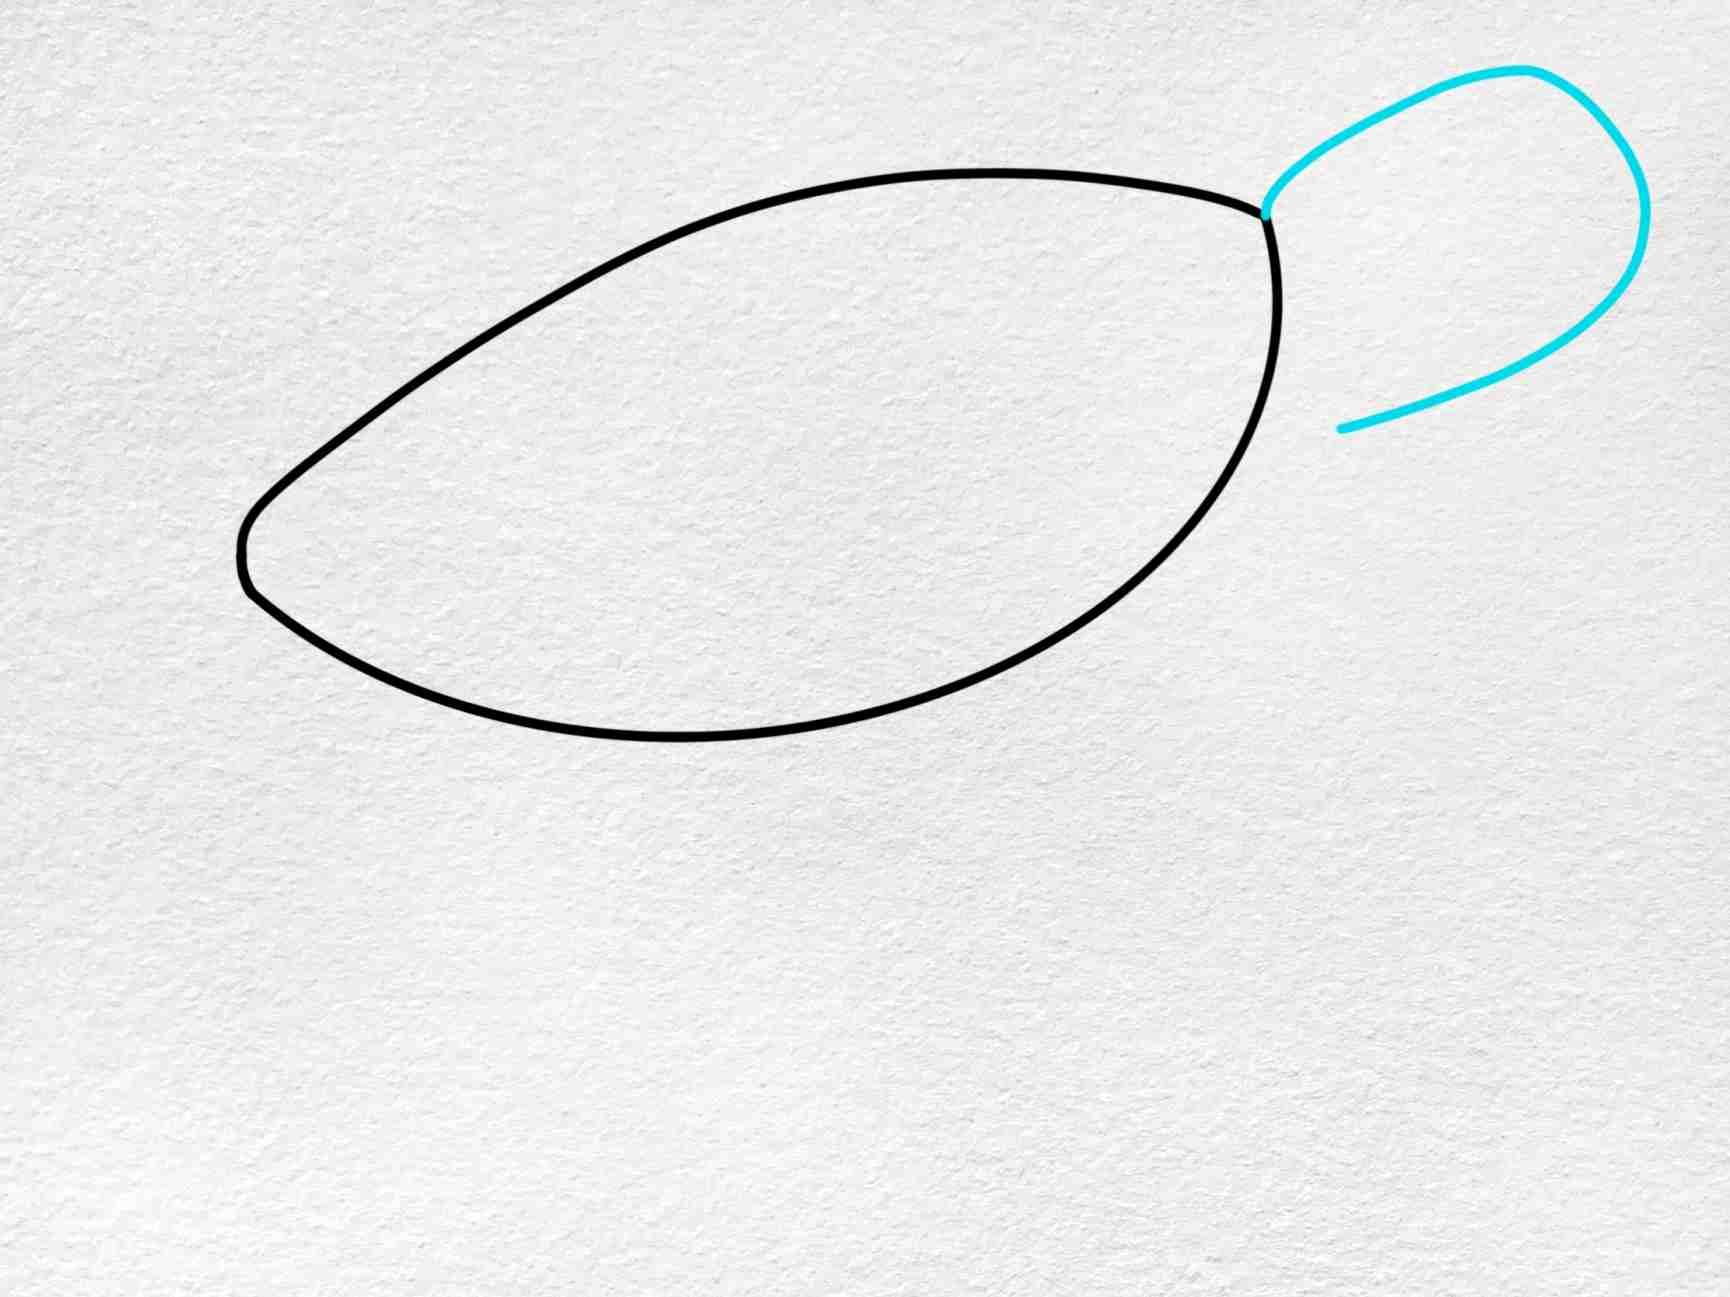 Sea Turtle Drawing Easy: Step 2